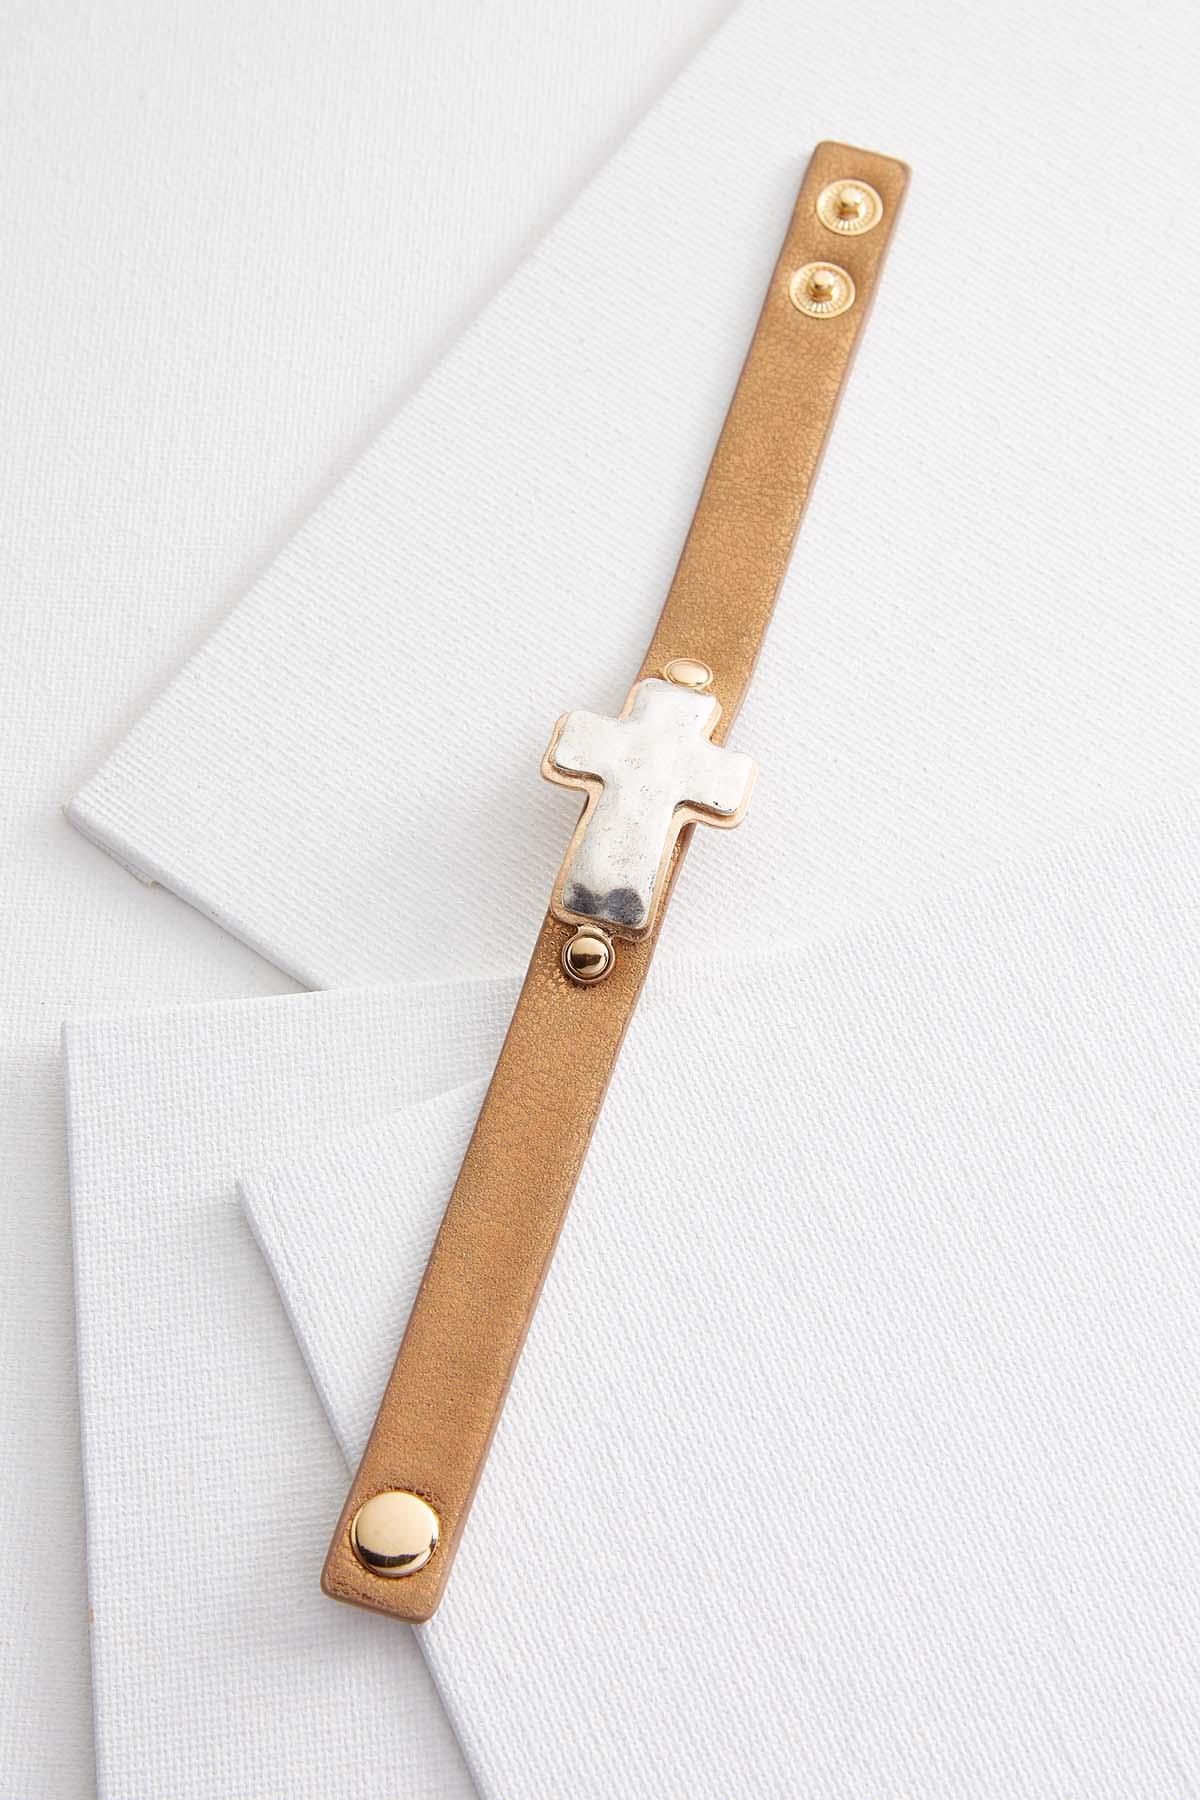 Hammered Cross Strap Bracelet